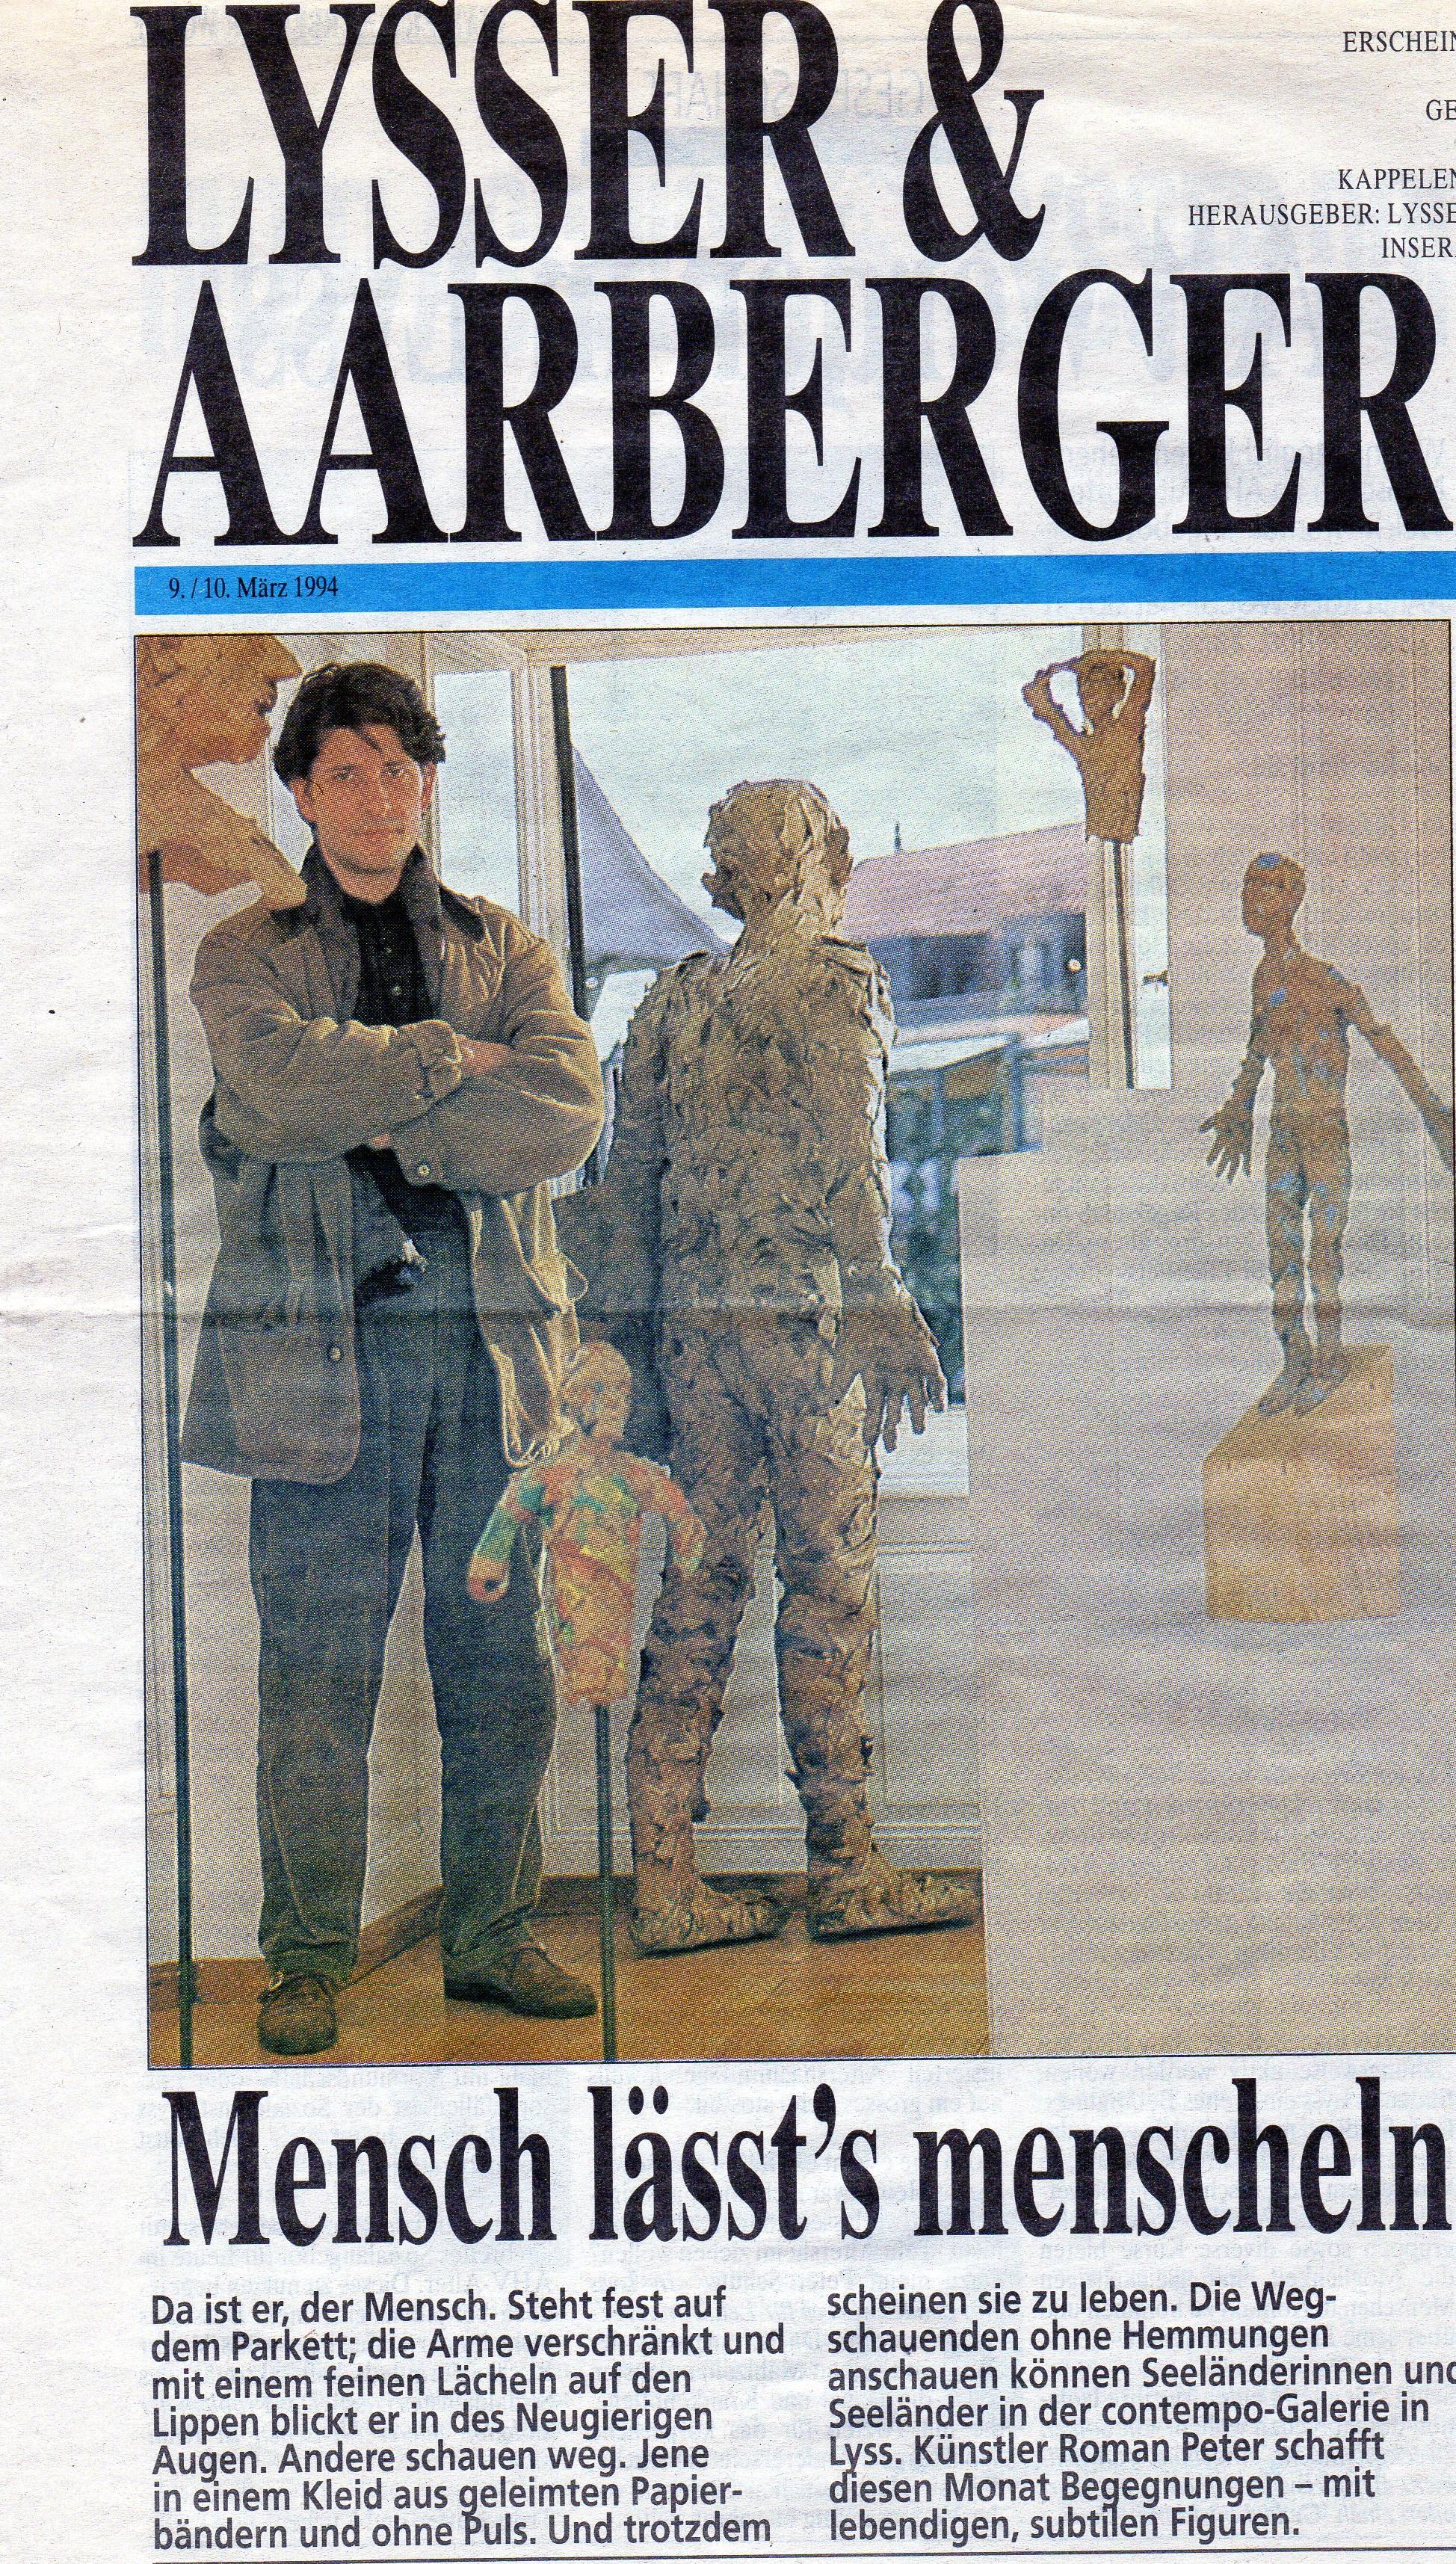 März 1994, Lysser & Aarberger Woche